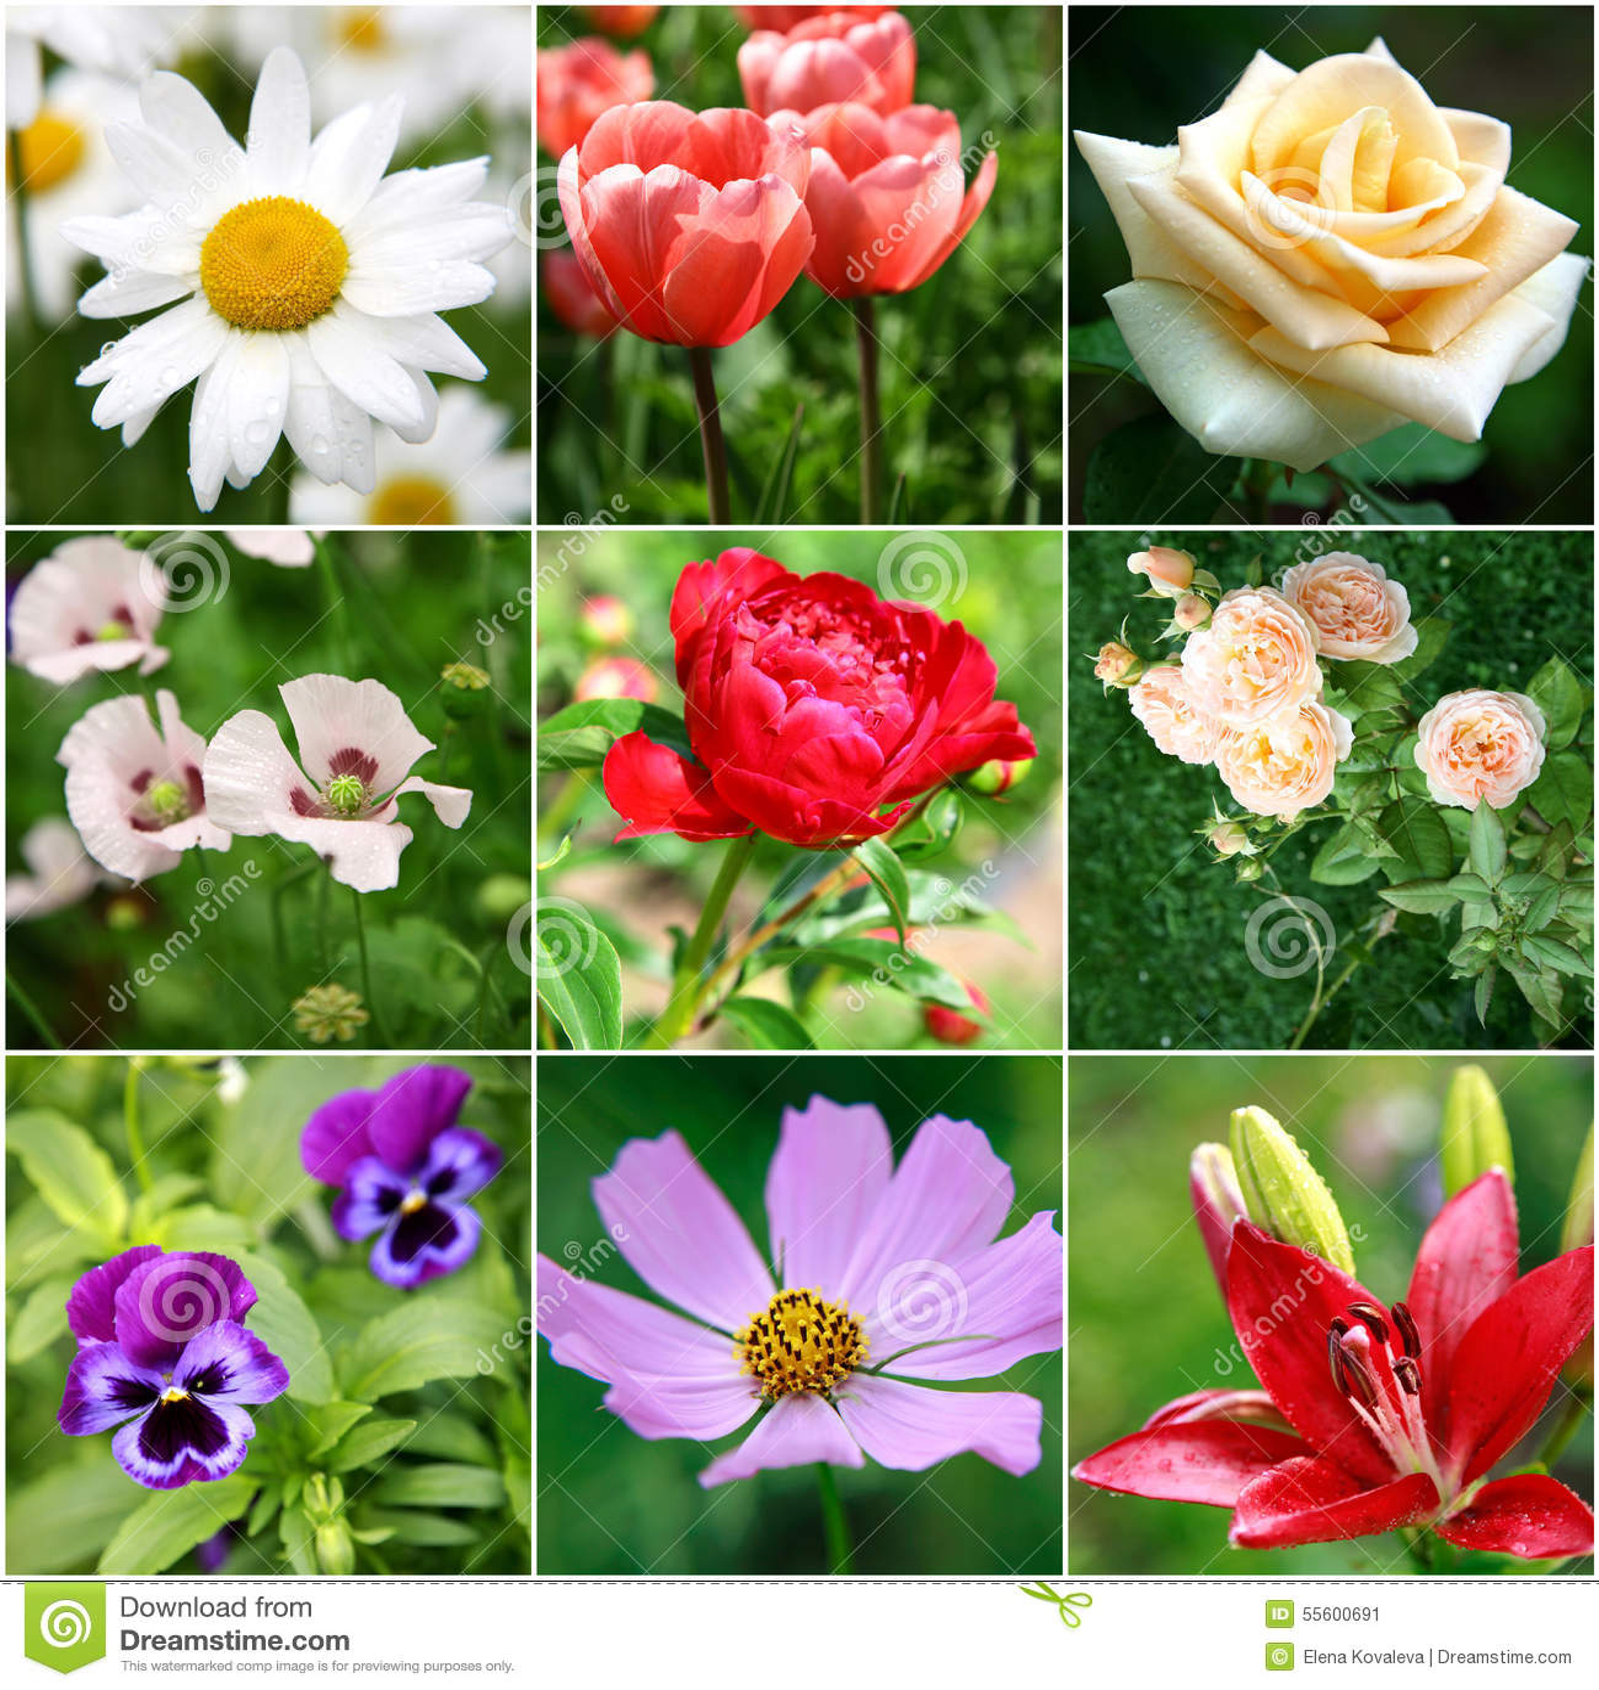 Collage of different beautiful flowers stock image image of collage of different beautiful flowers izmirmasajfo